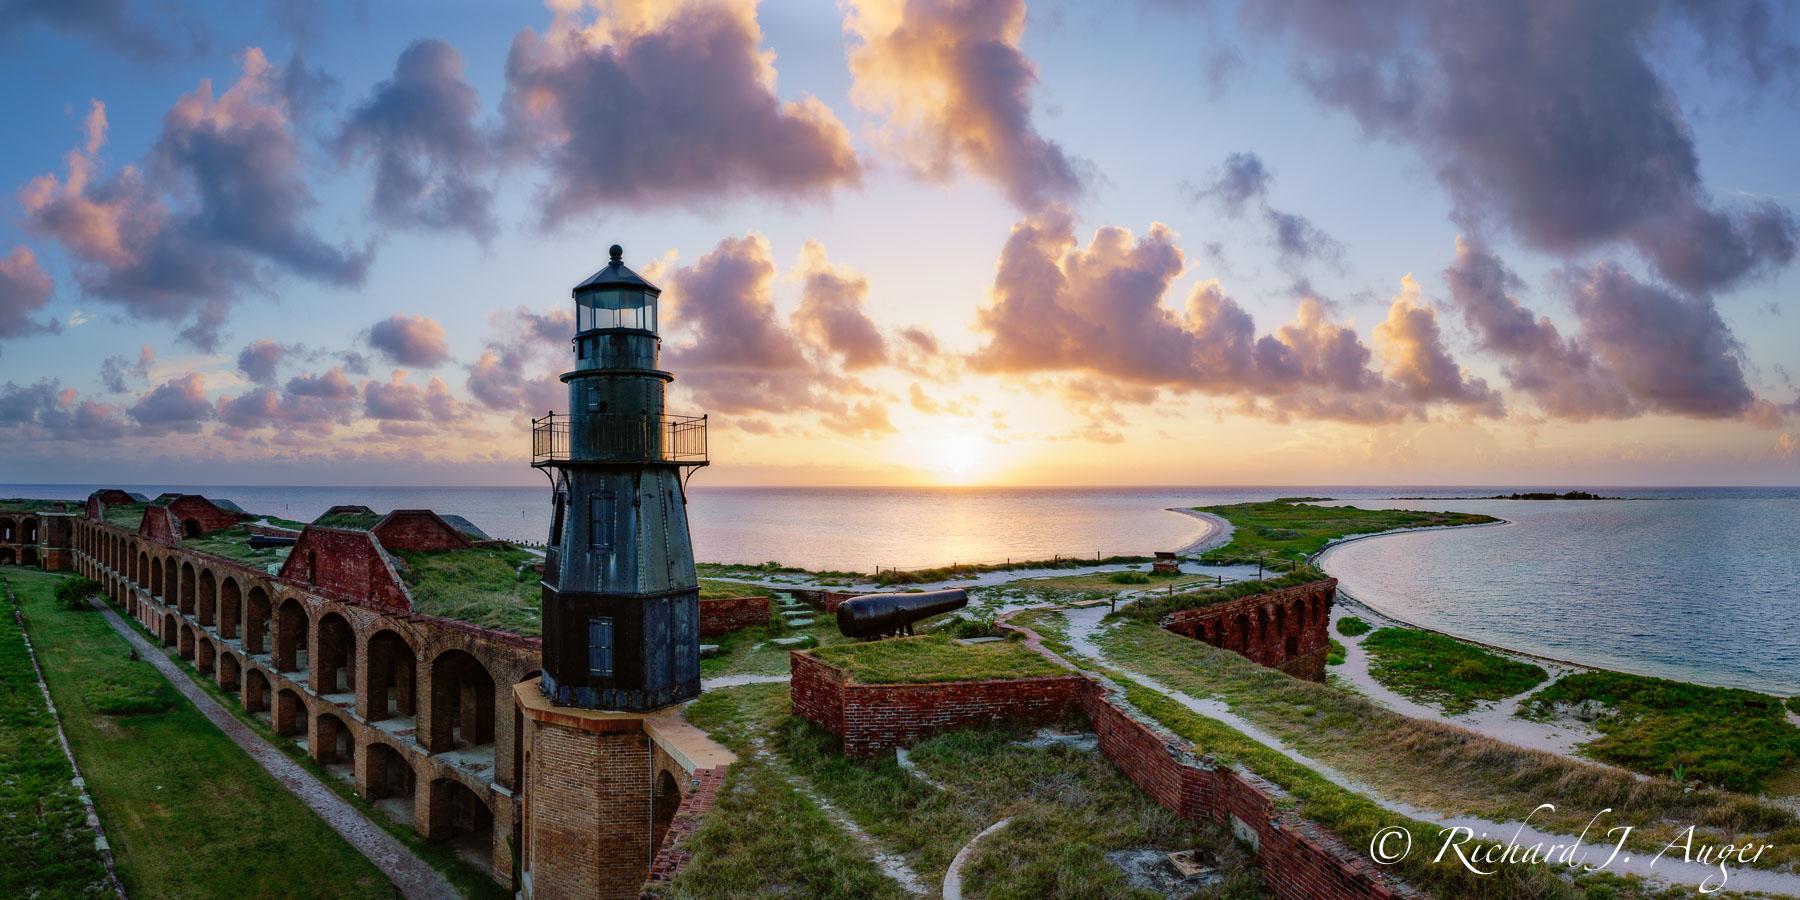 Dry Tortugas, Garden Key Lighthouse, Florida, Sunrise, Fort, Lighthouse, photograph, landcape, ocean, seascape, panorama, photographer